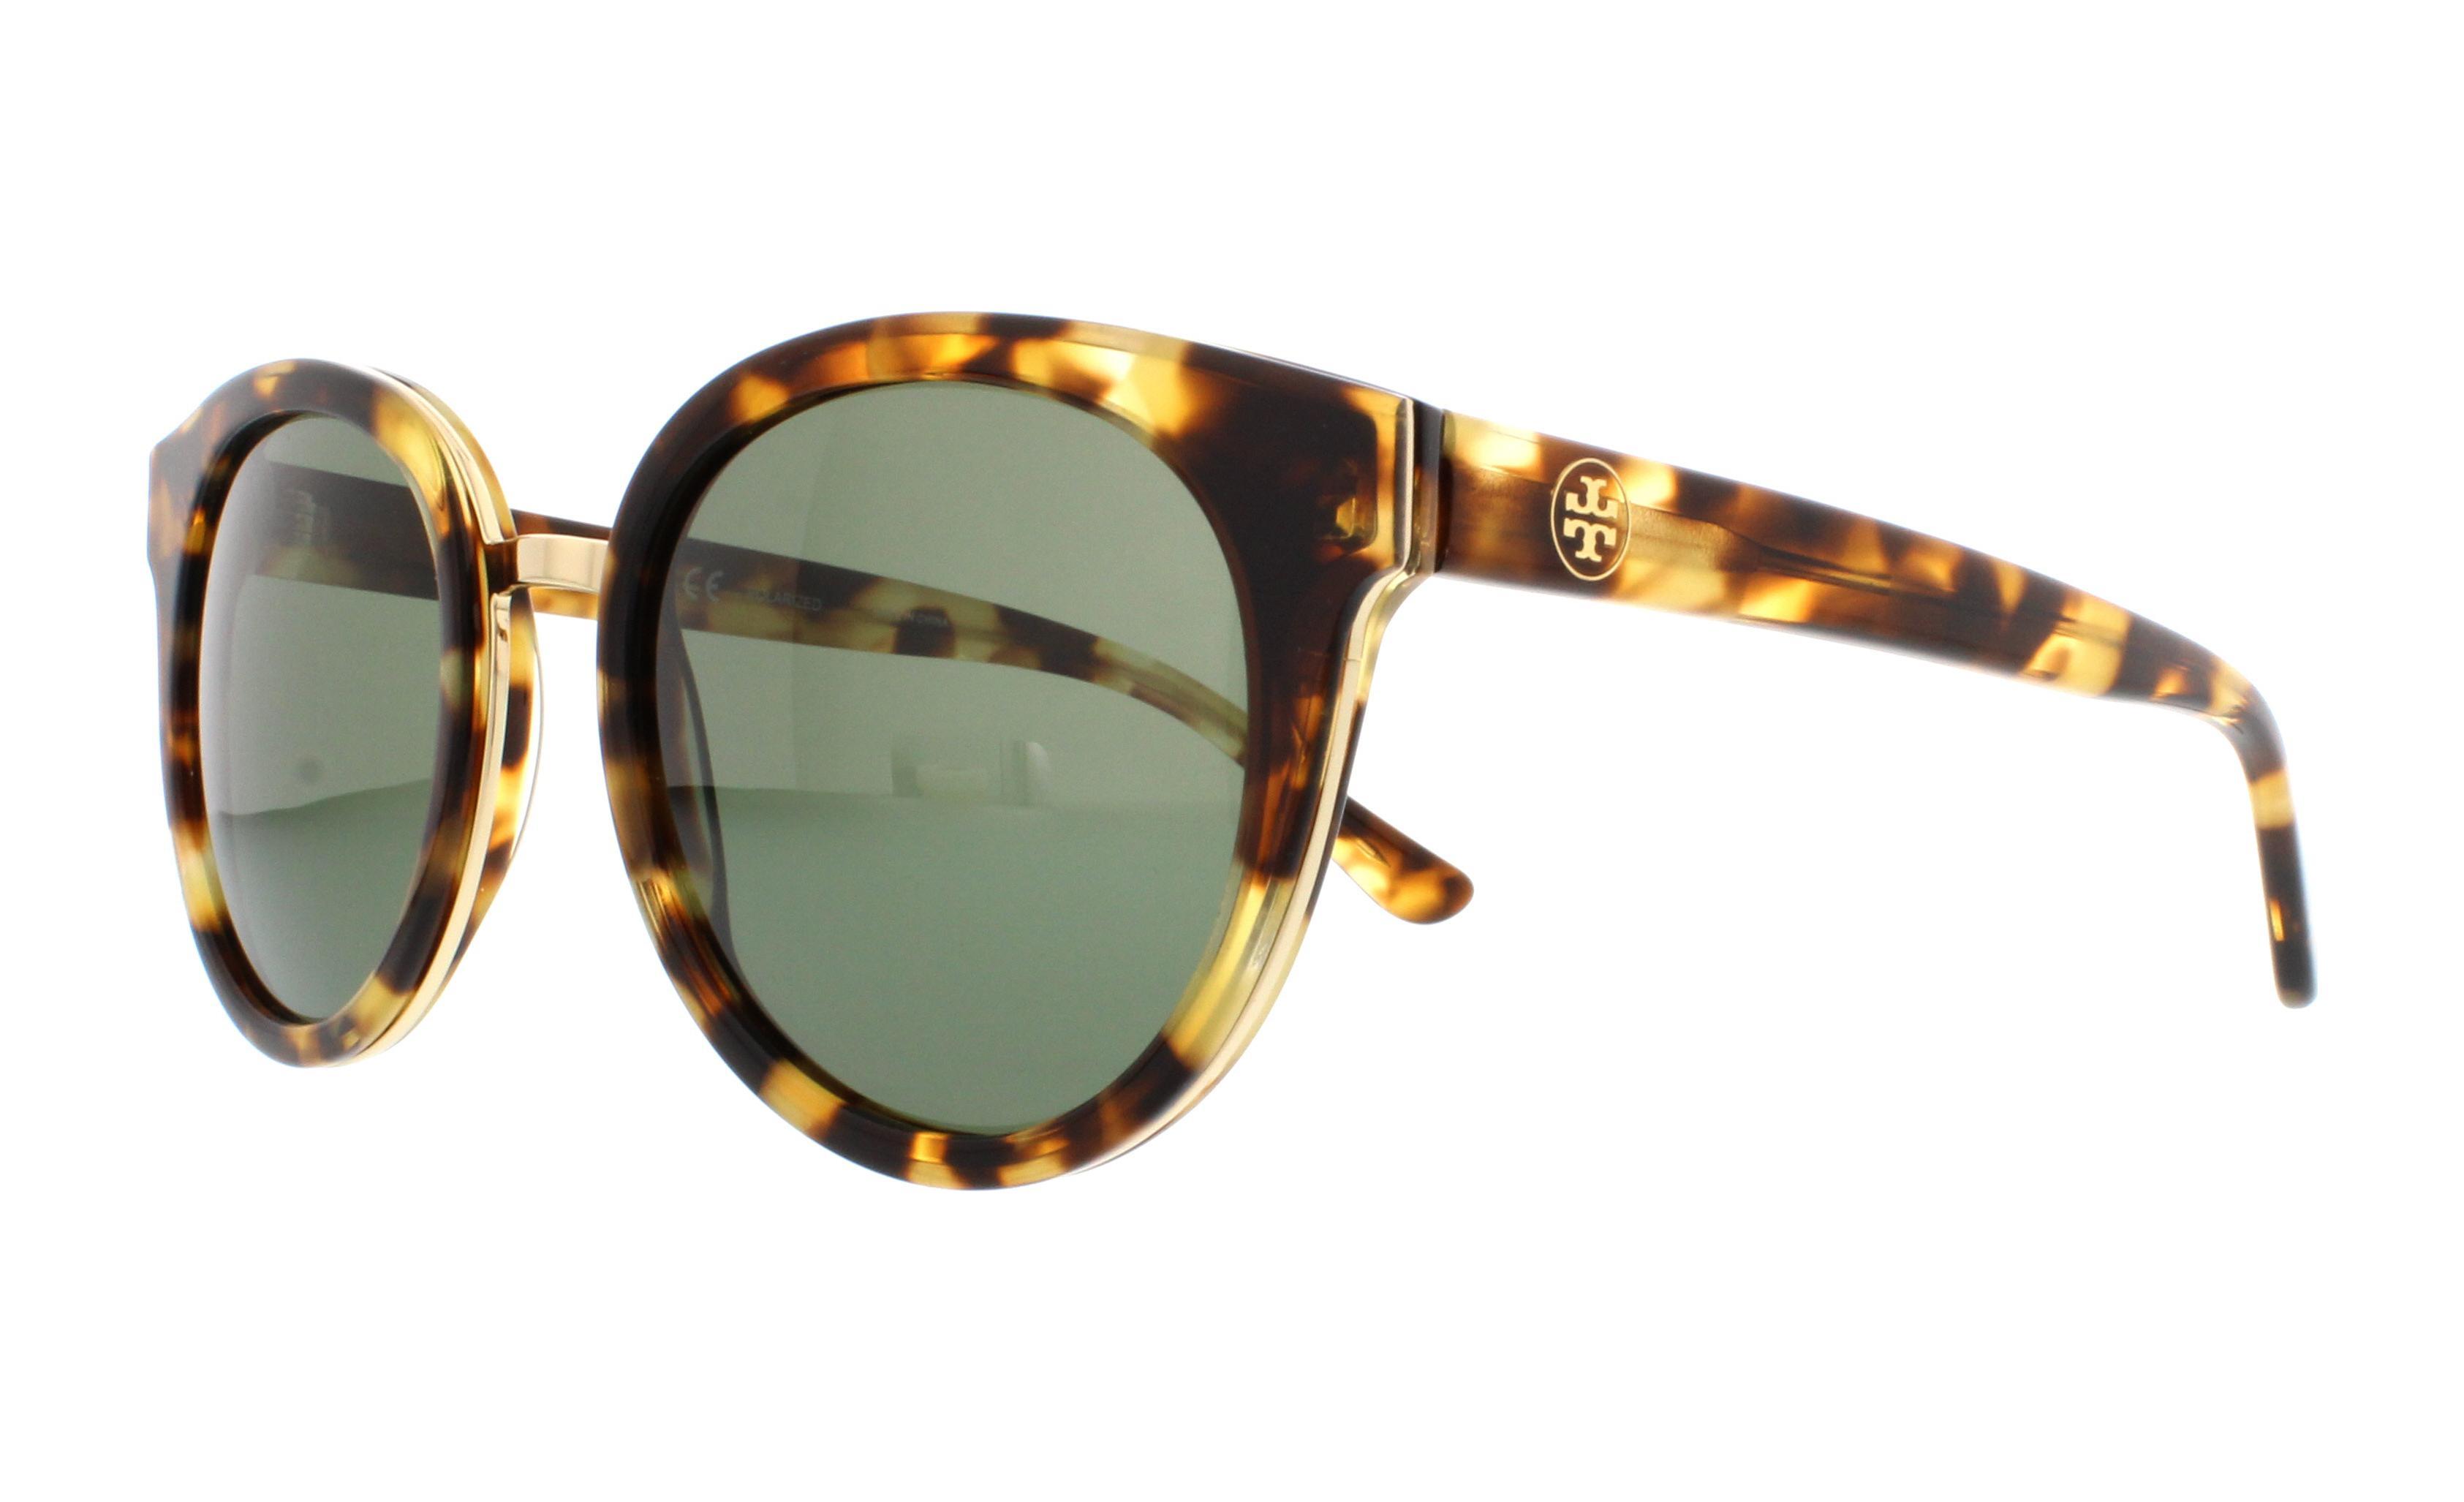 9248e958b3c97 TORY BURCH Sunglasses TY7062 PANAMA 11509A Tokyo Tortoise 53MM ...